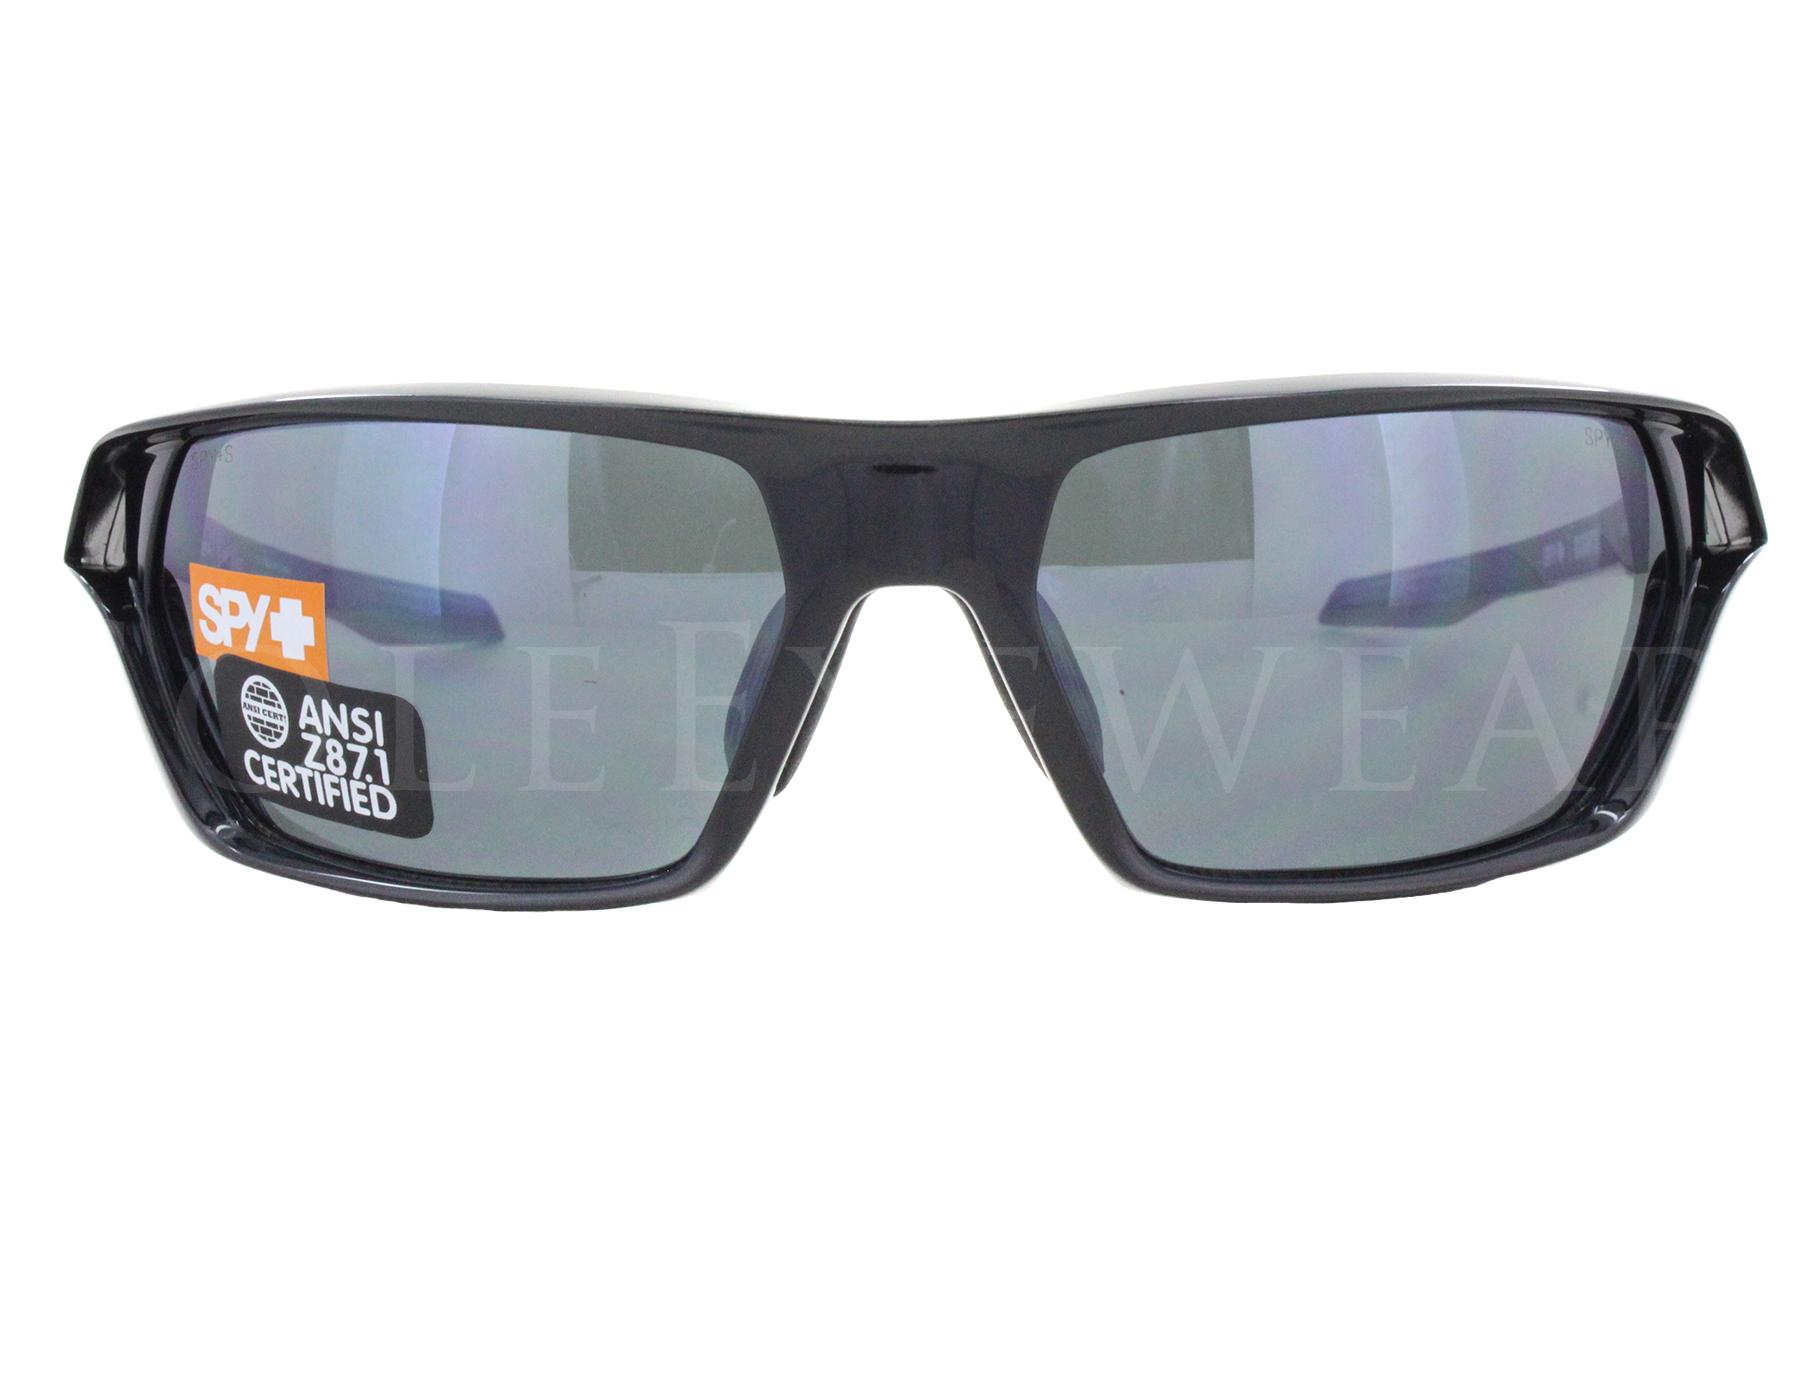 de0427357e Spy Bounty Polarized Sunglasses (ansi Certified) « One More Soul